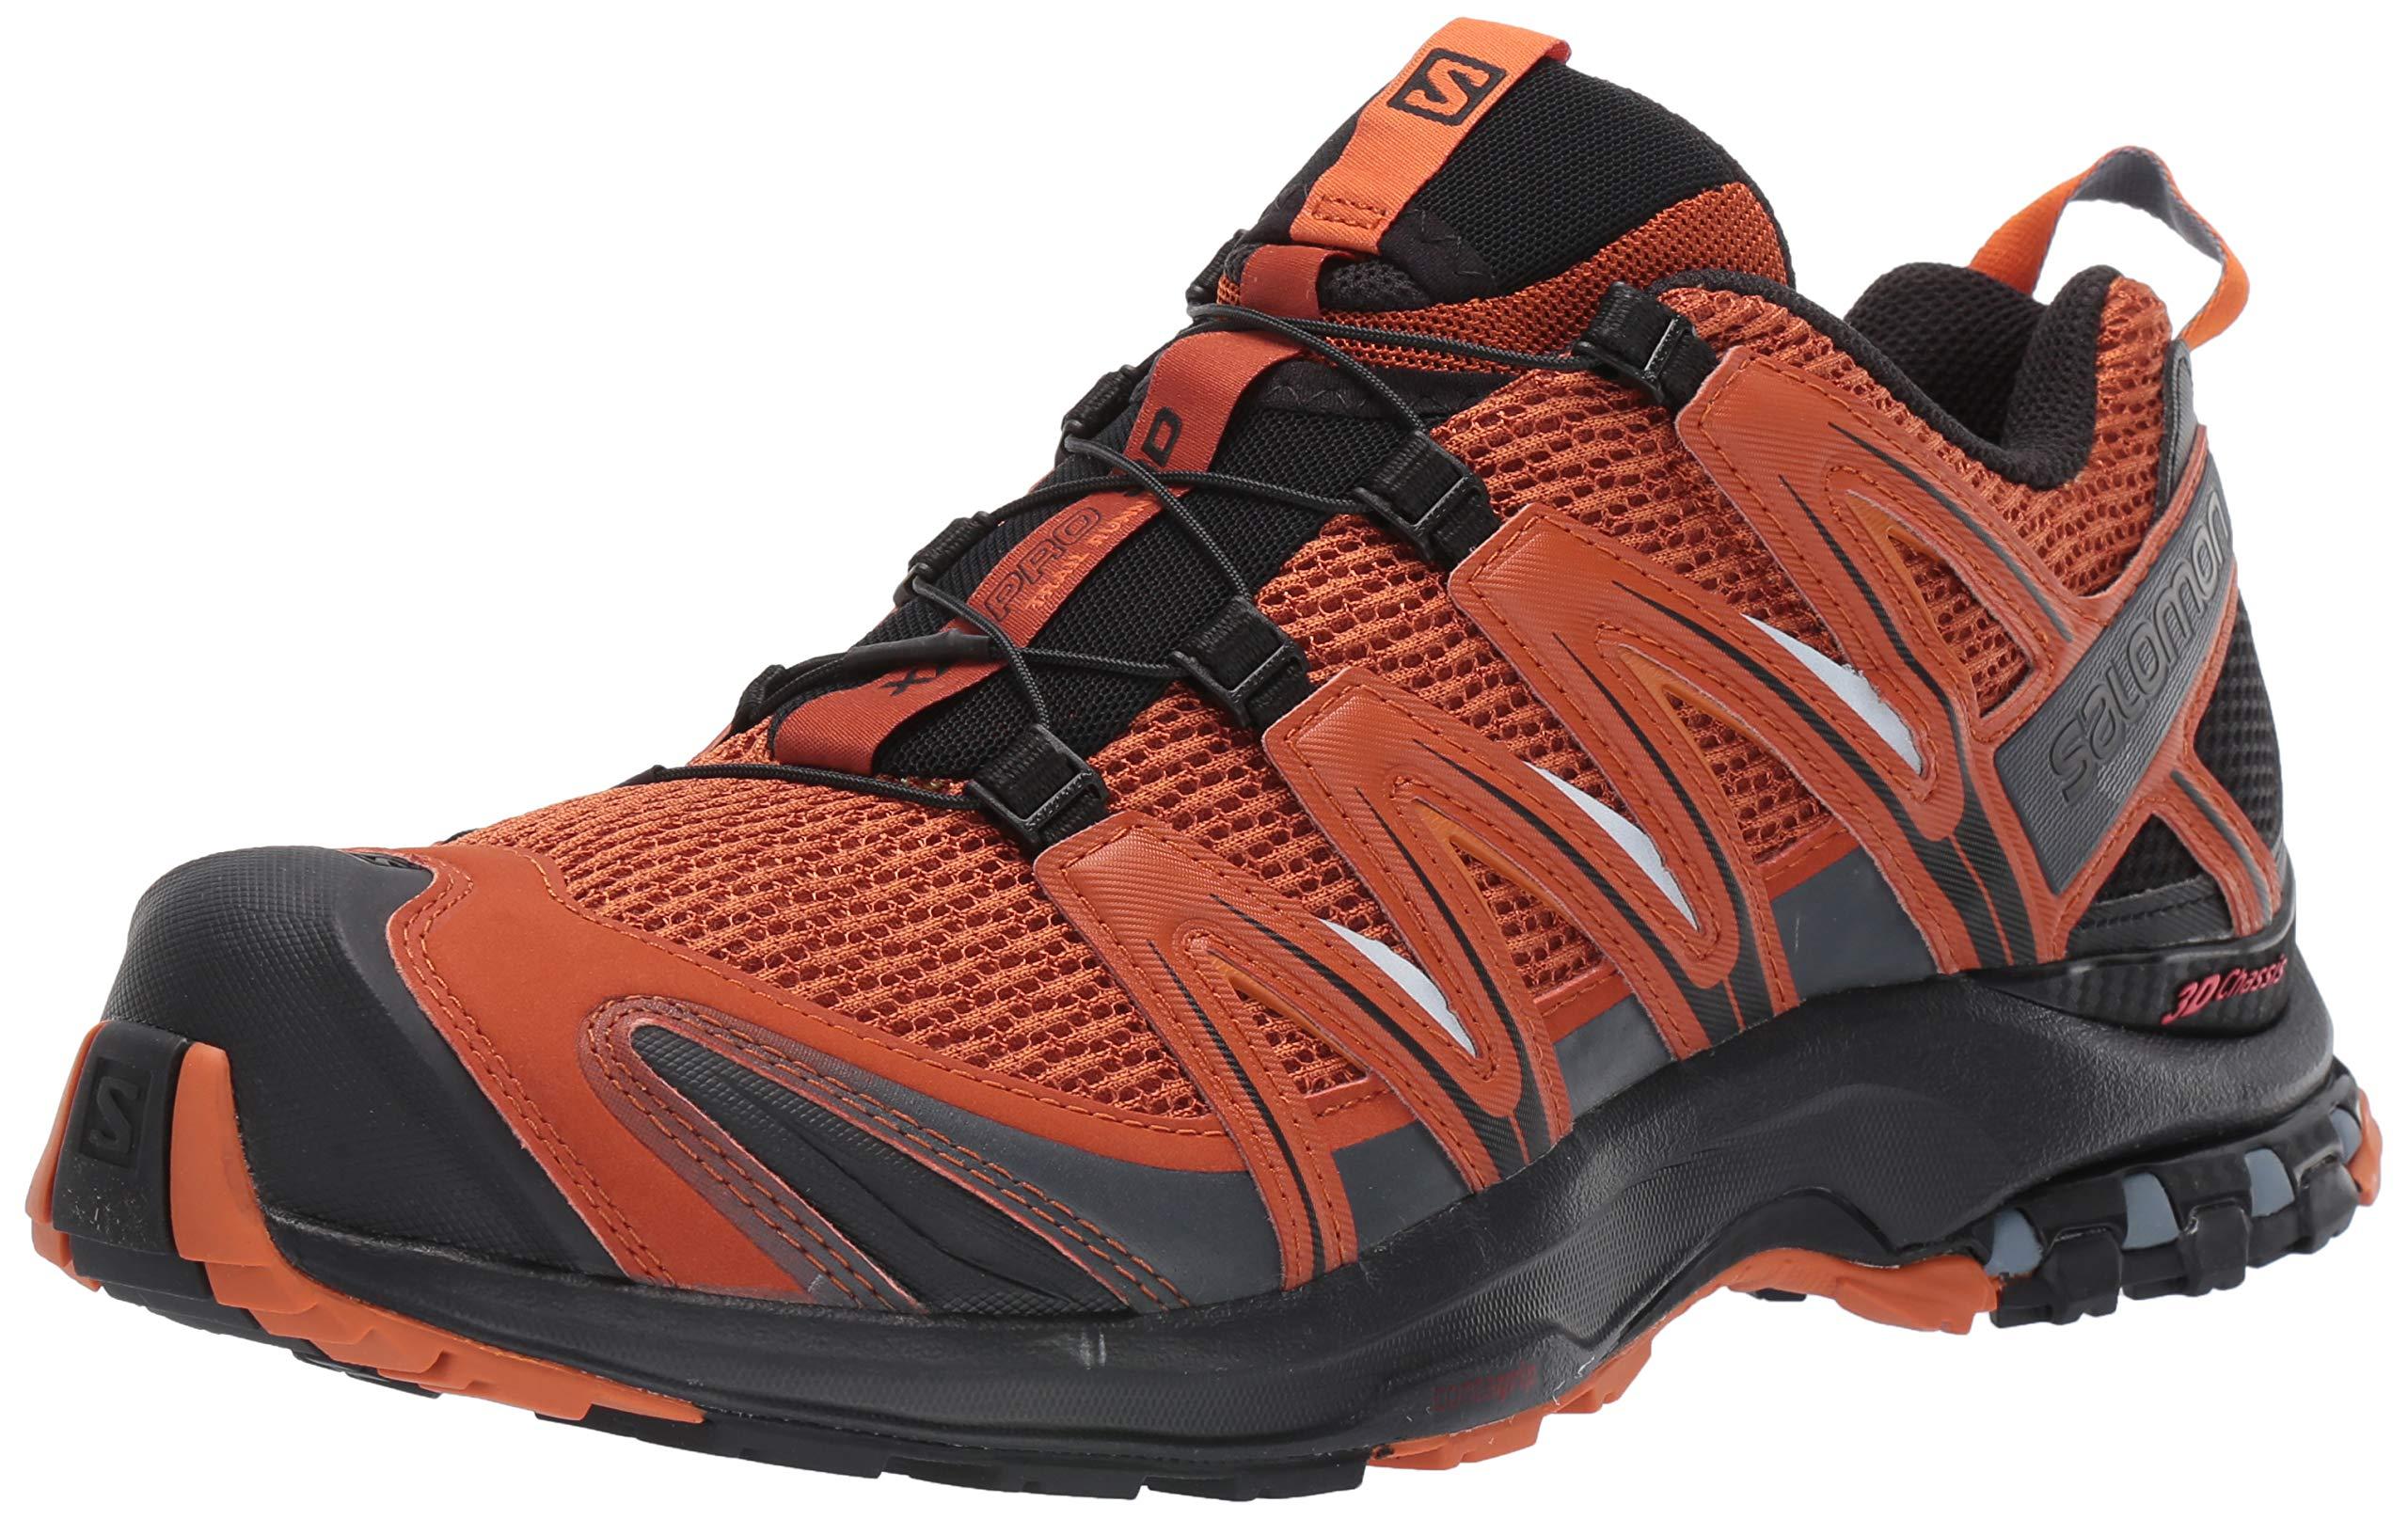 3b565725eb Salomon XA Pro 3D, Zapatillas de Trail Running para Hombre product image